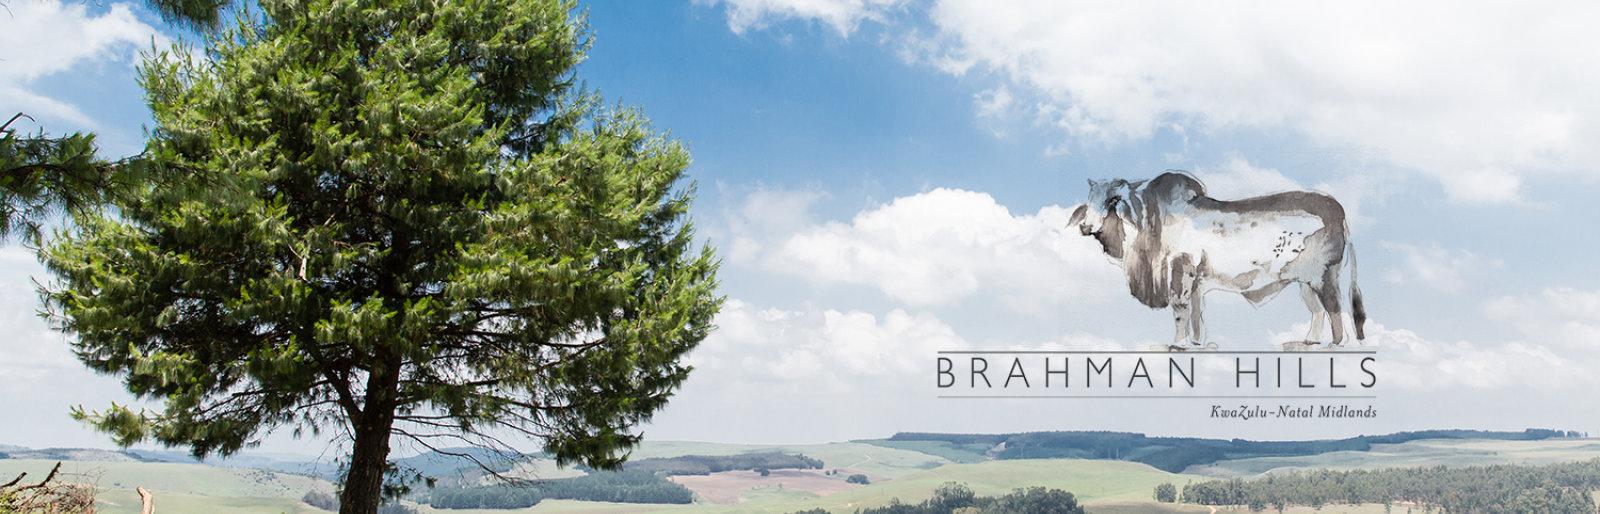 Brahman Hills